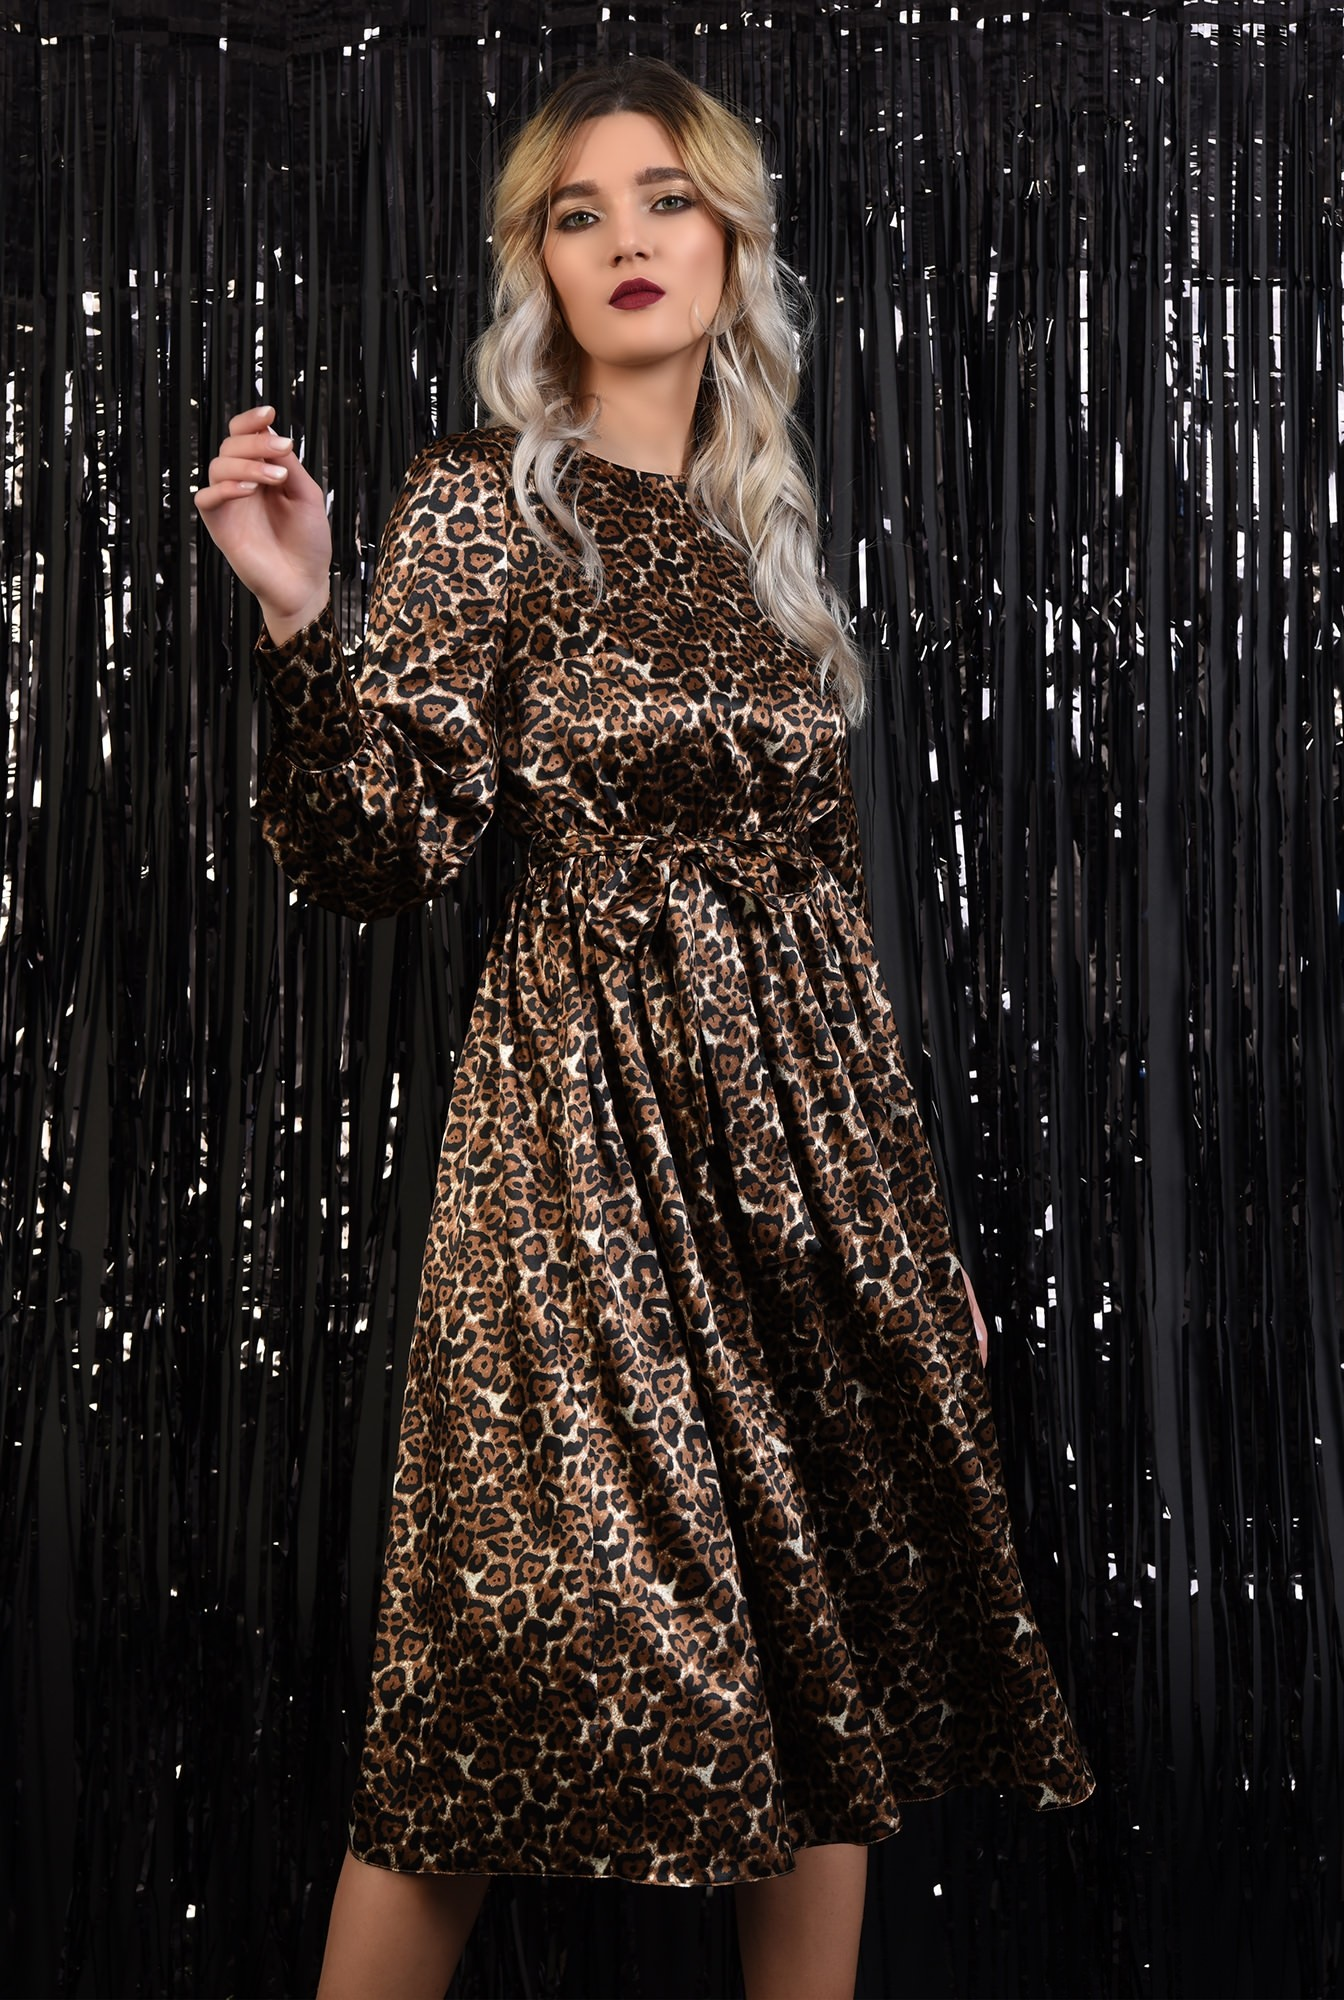 0 - 360 - rochie eleganta, din satin, animal print, nasturi la spate, evazata